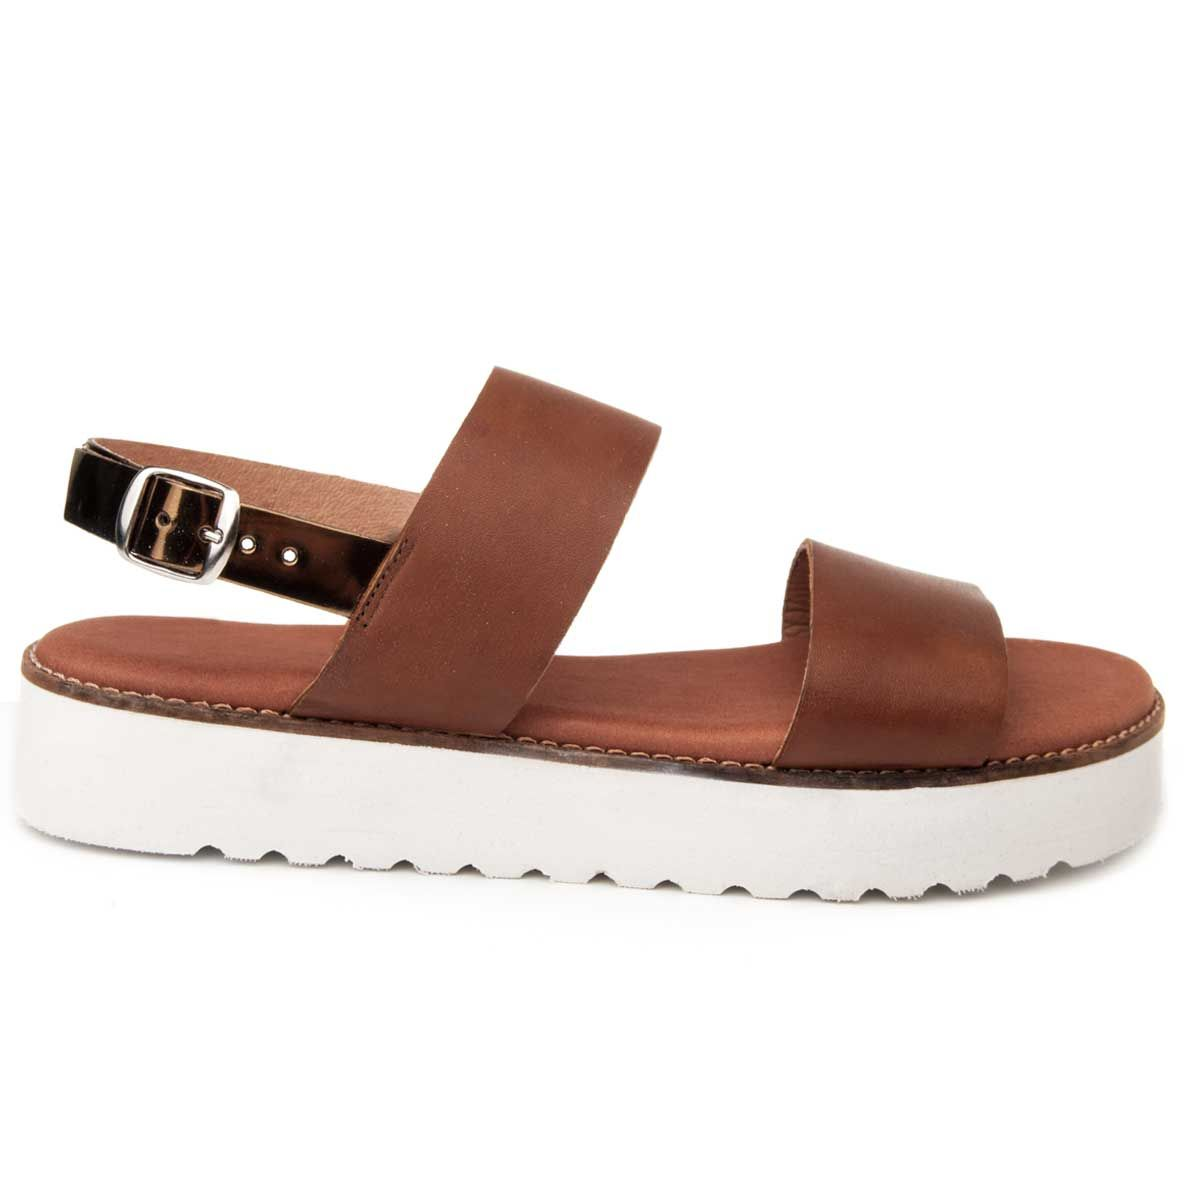 Purapiel Flat Wedge Sandal in Camel